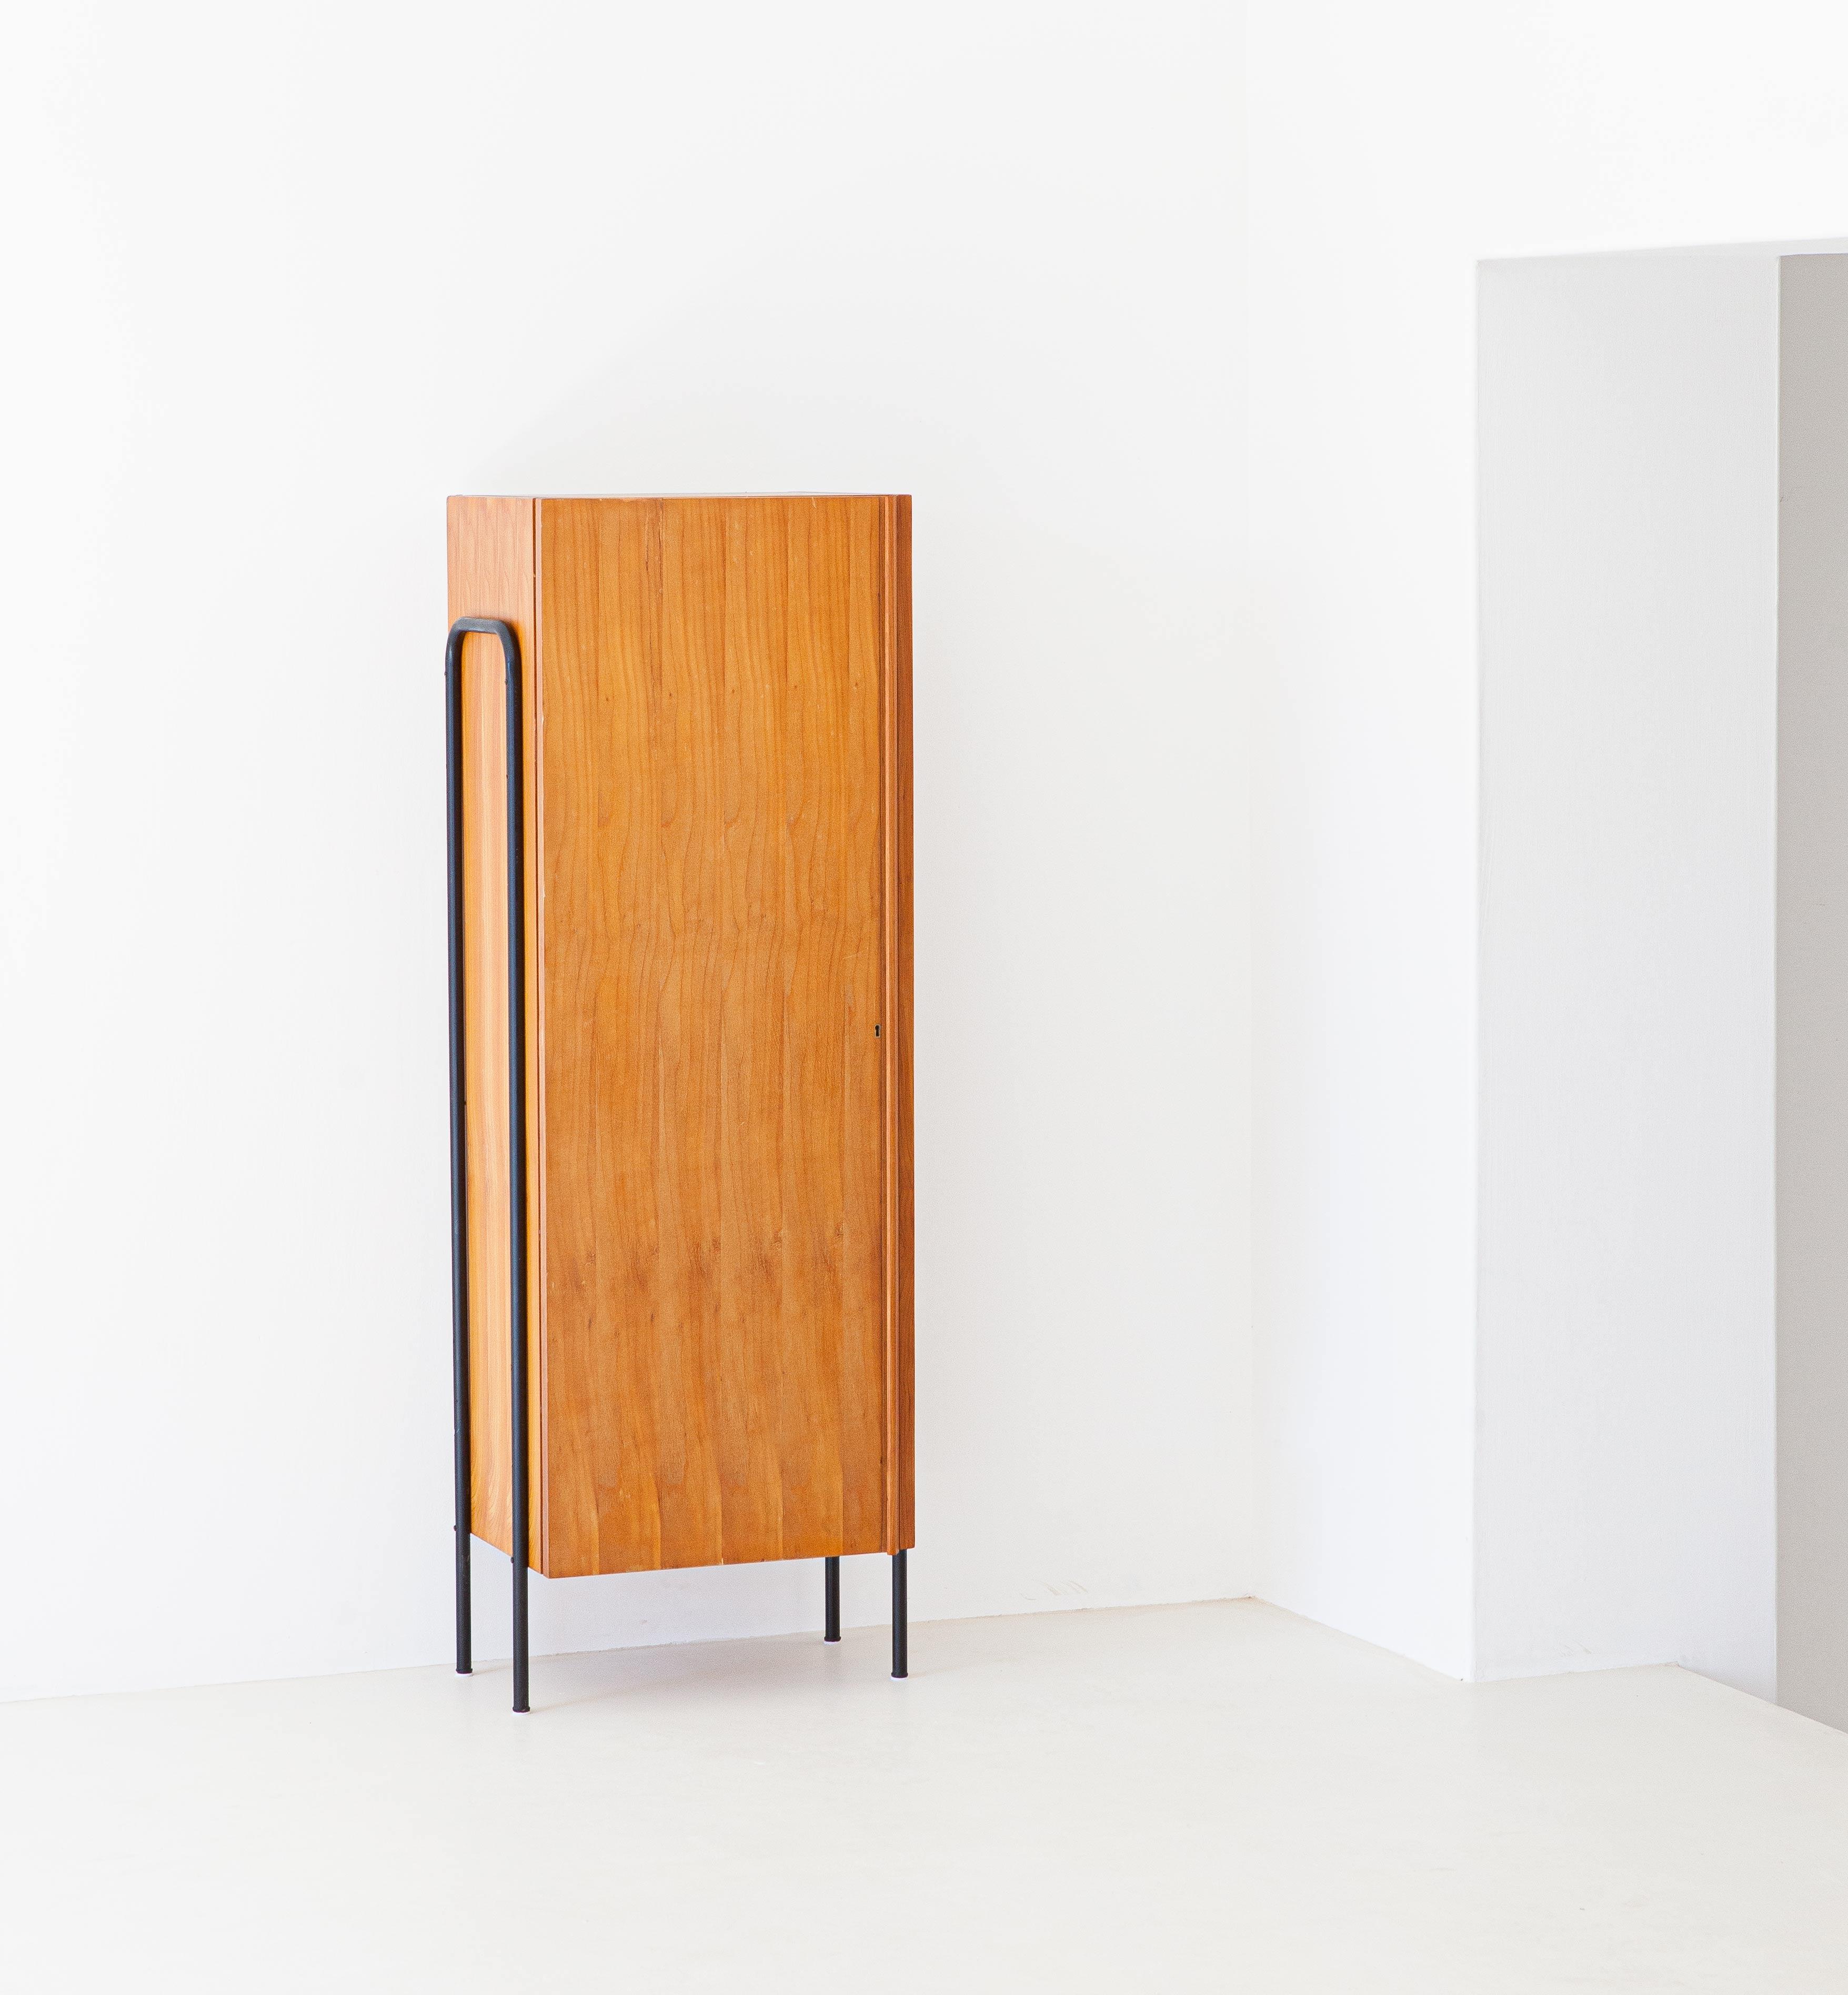 1950s-italian-light-wood-and-iron-wardrobe-cabinet-3-st114